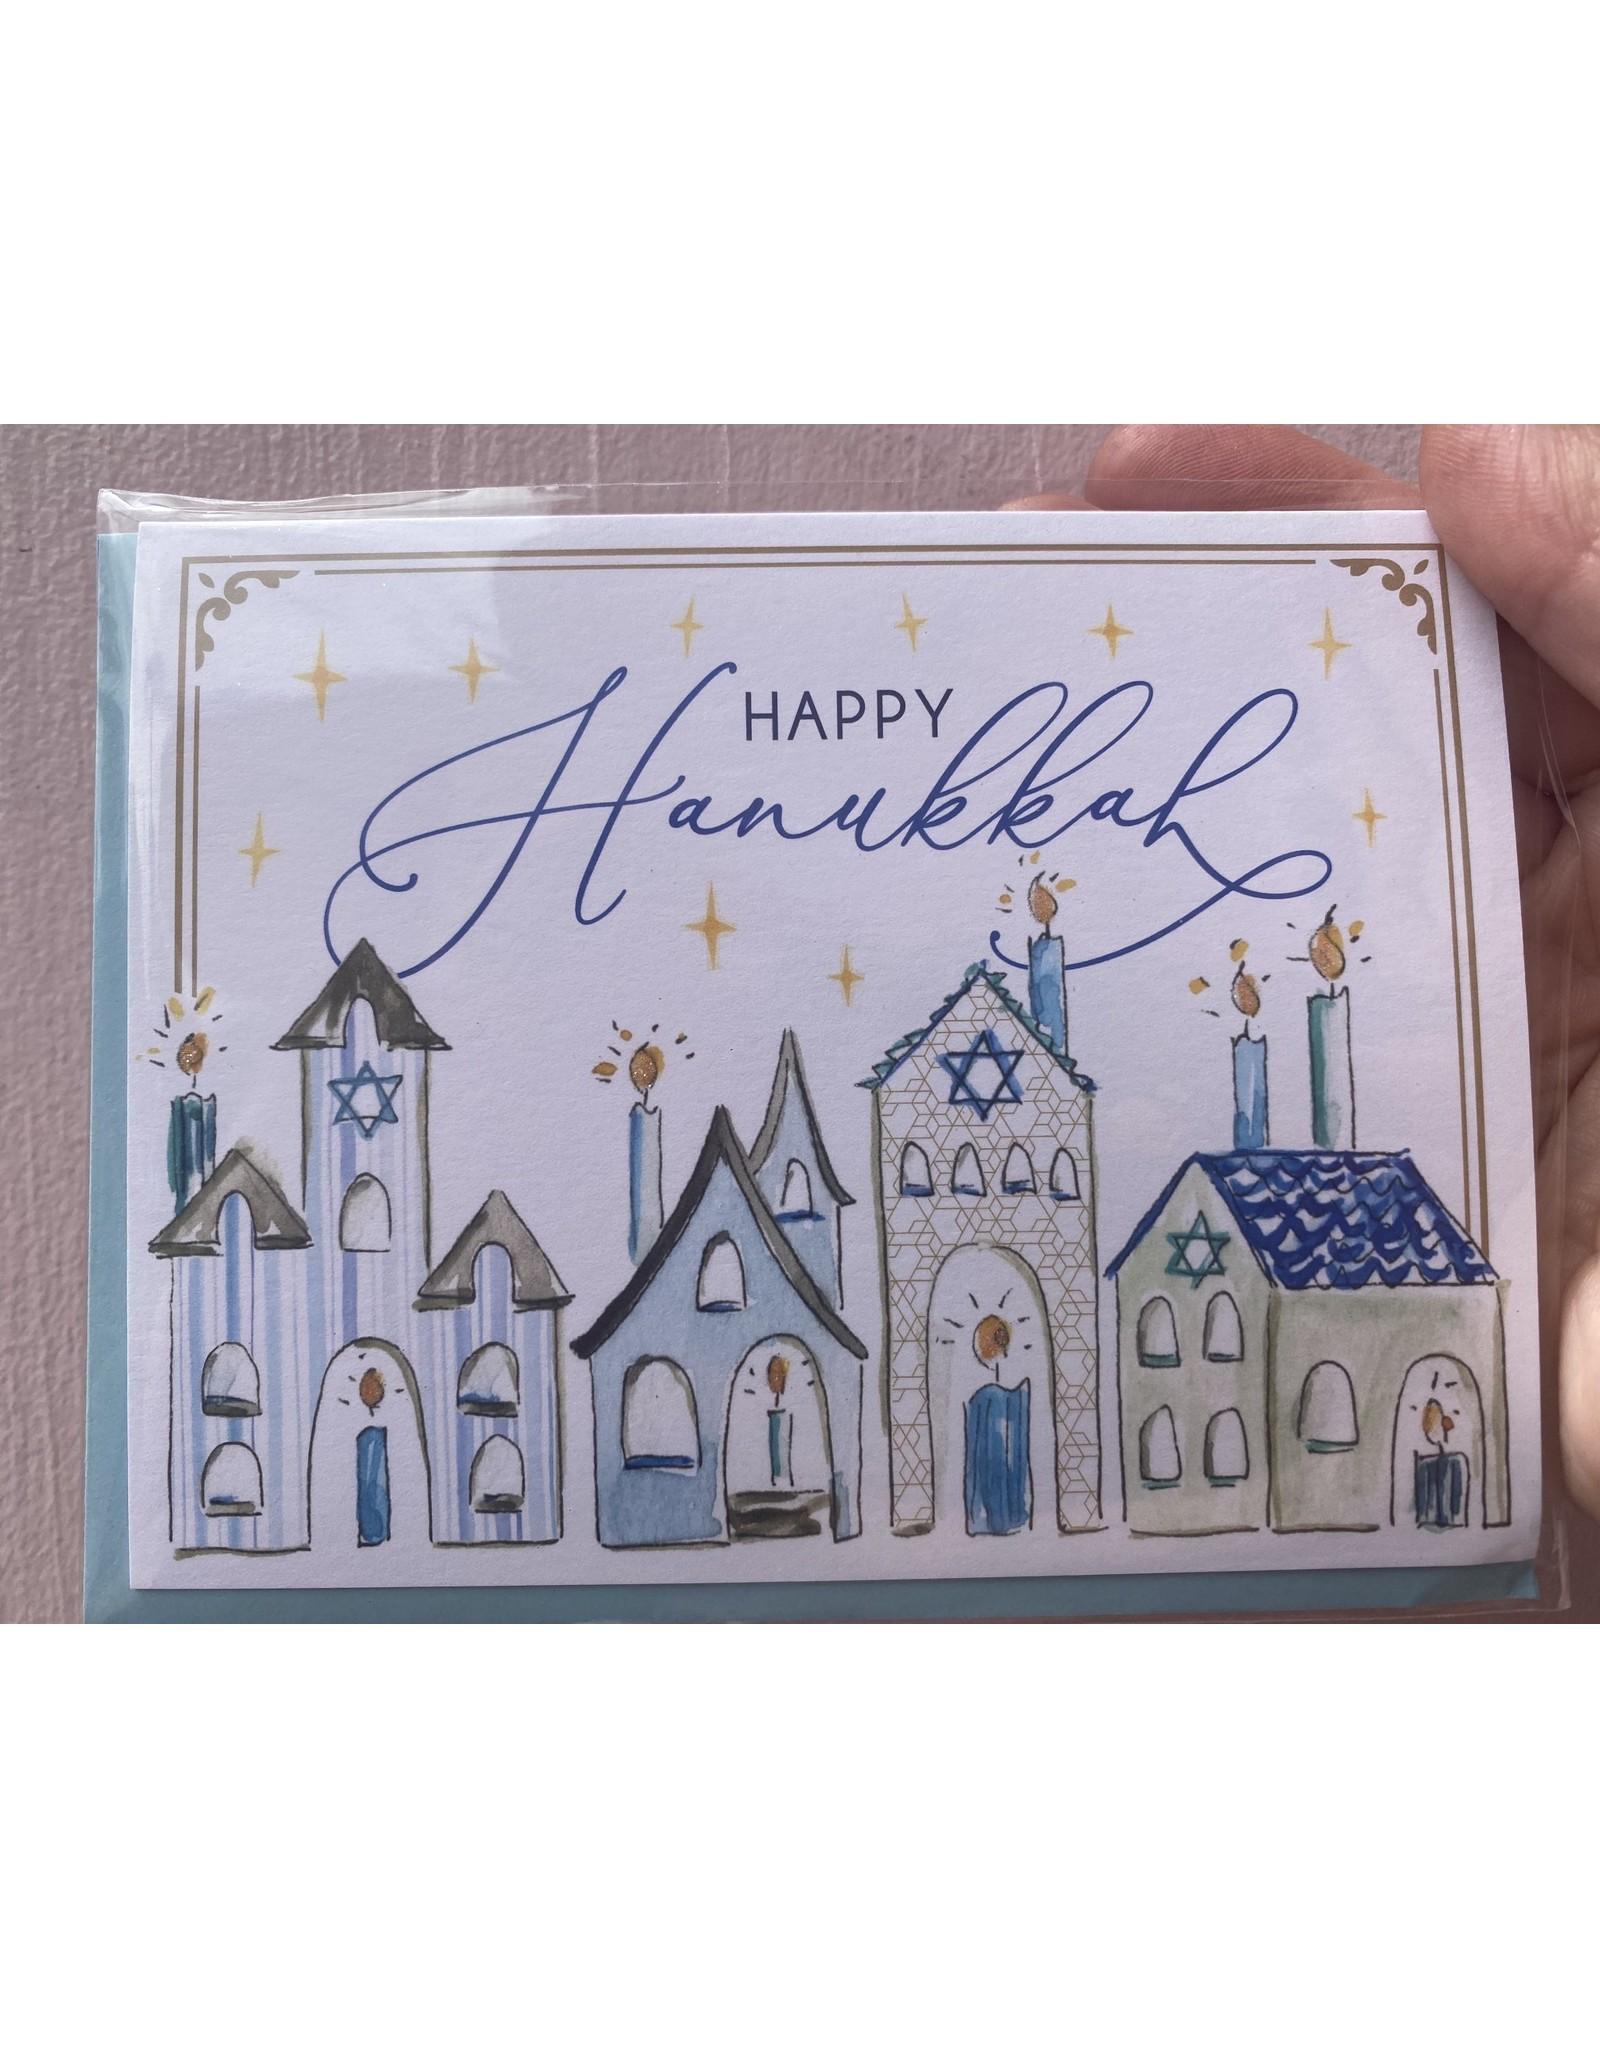 RoseanneBECK Collection Happy Hanukkah Handpainted Homes Card